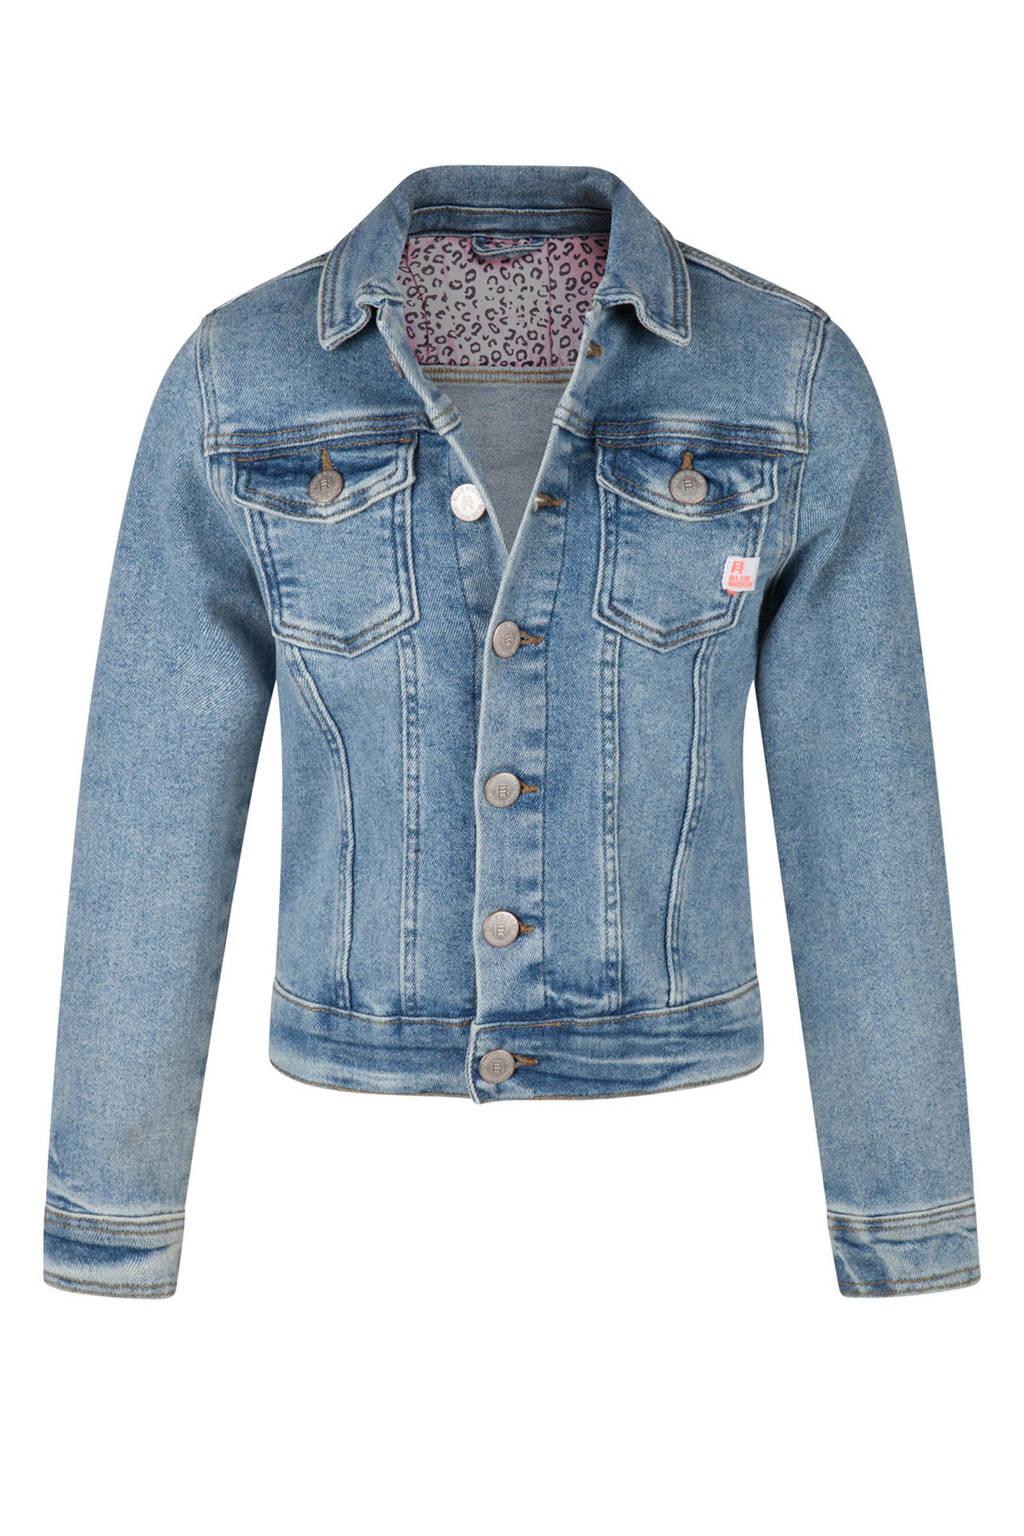 WE Fashion Blue Ridge spijkerjas, Light denim